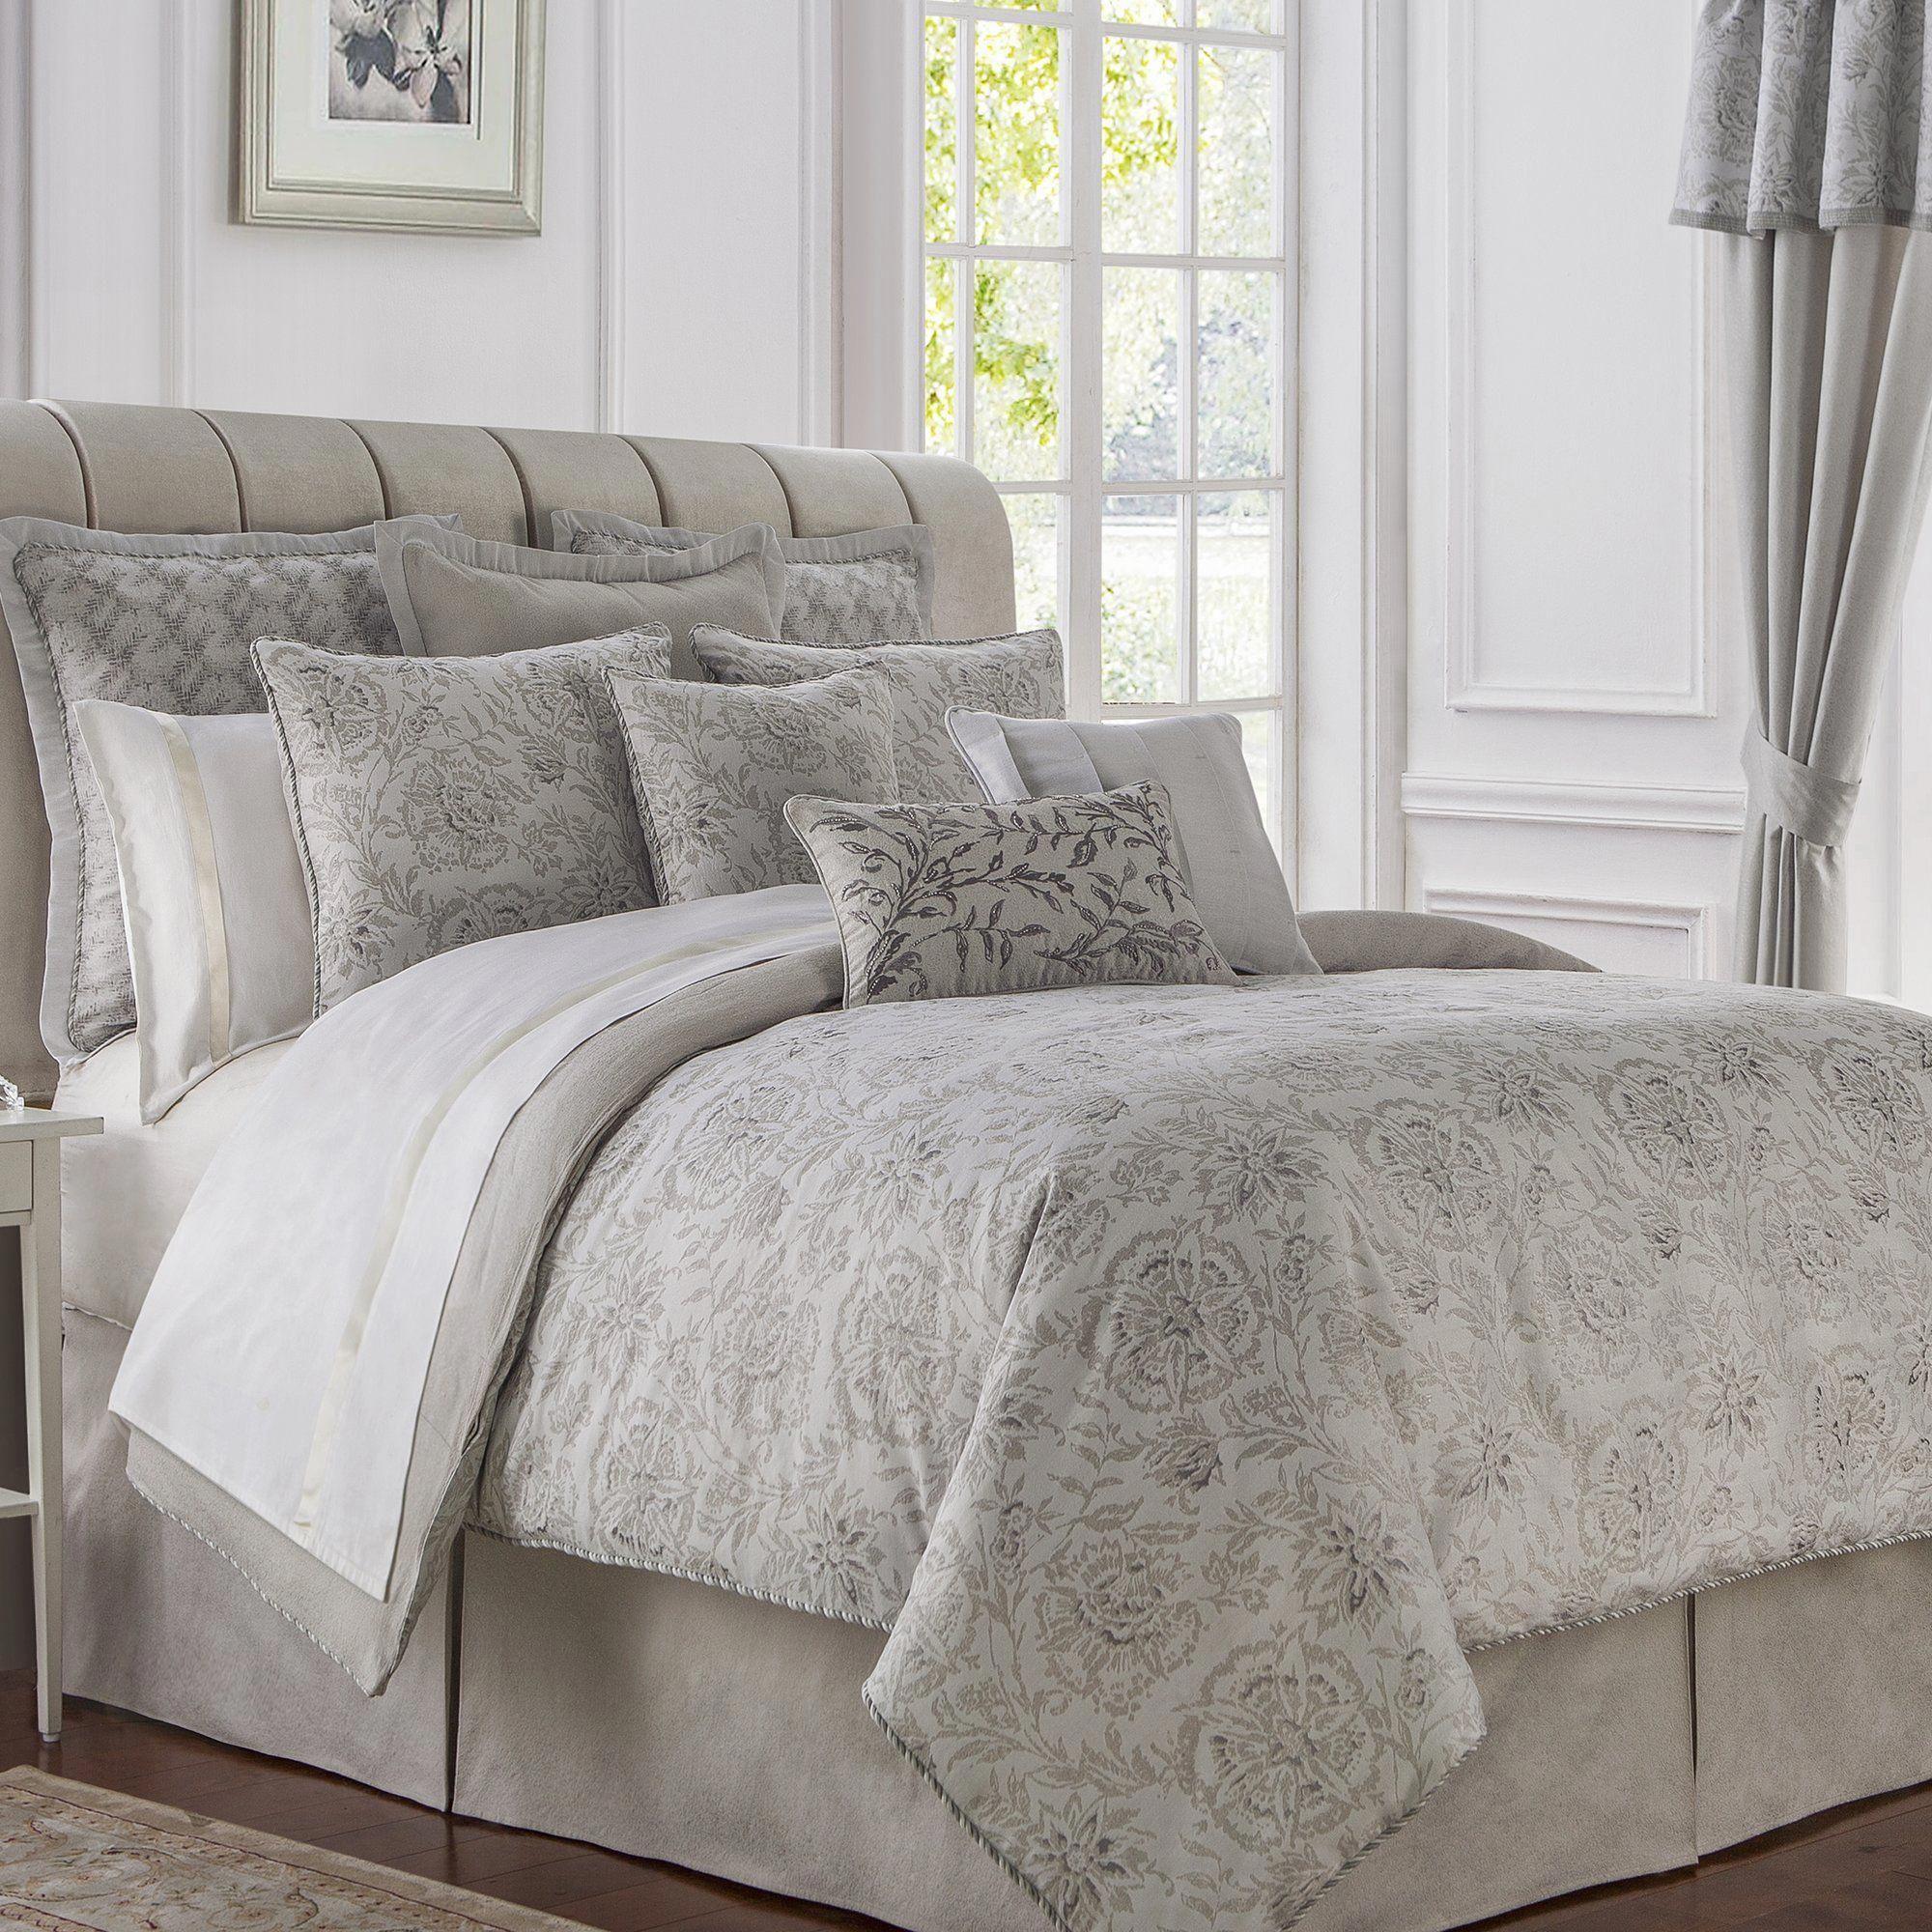 Elegant Bedspreads Luxury Bedding Favouritebedlinenideas Favouritebedroom Comforter Sets Bed Linens Luxury King Comforter Sets